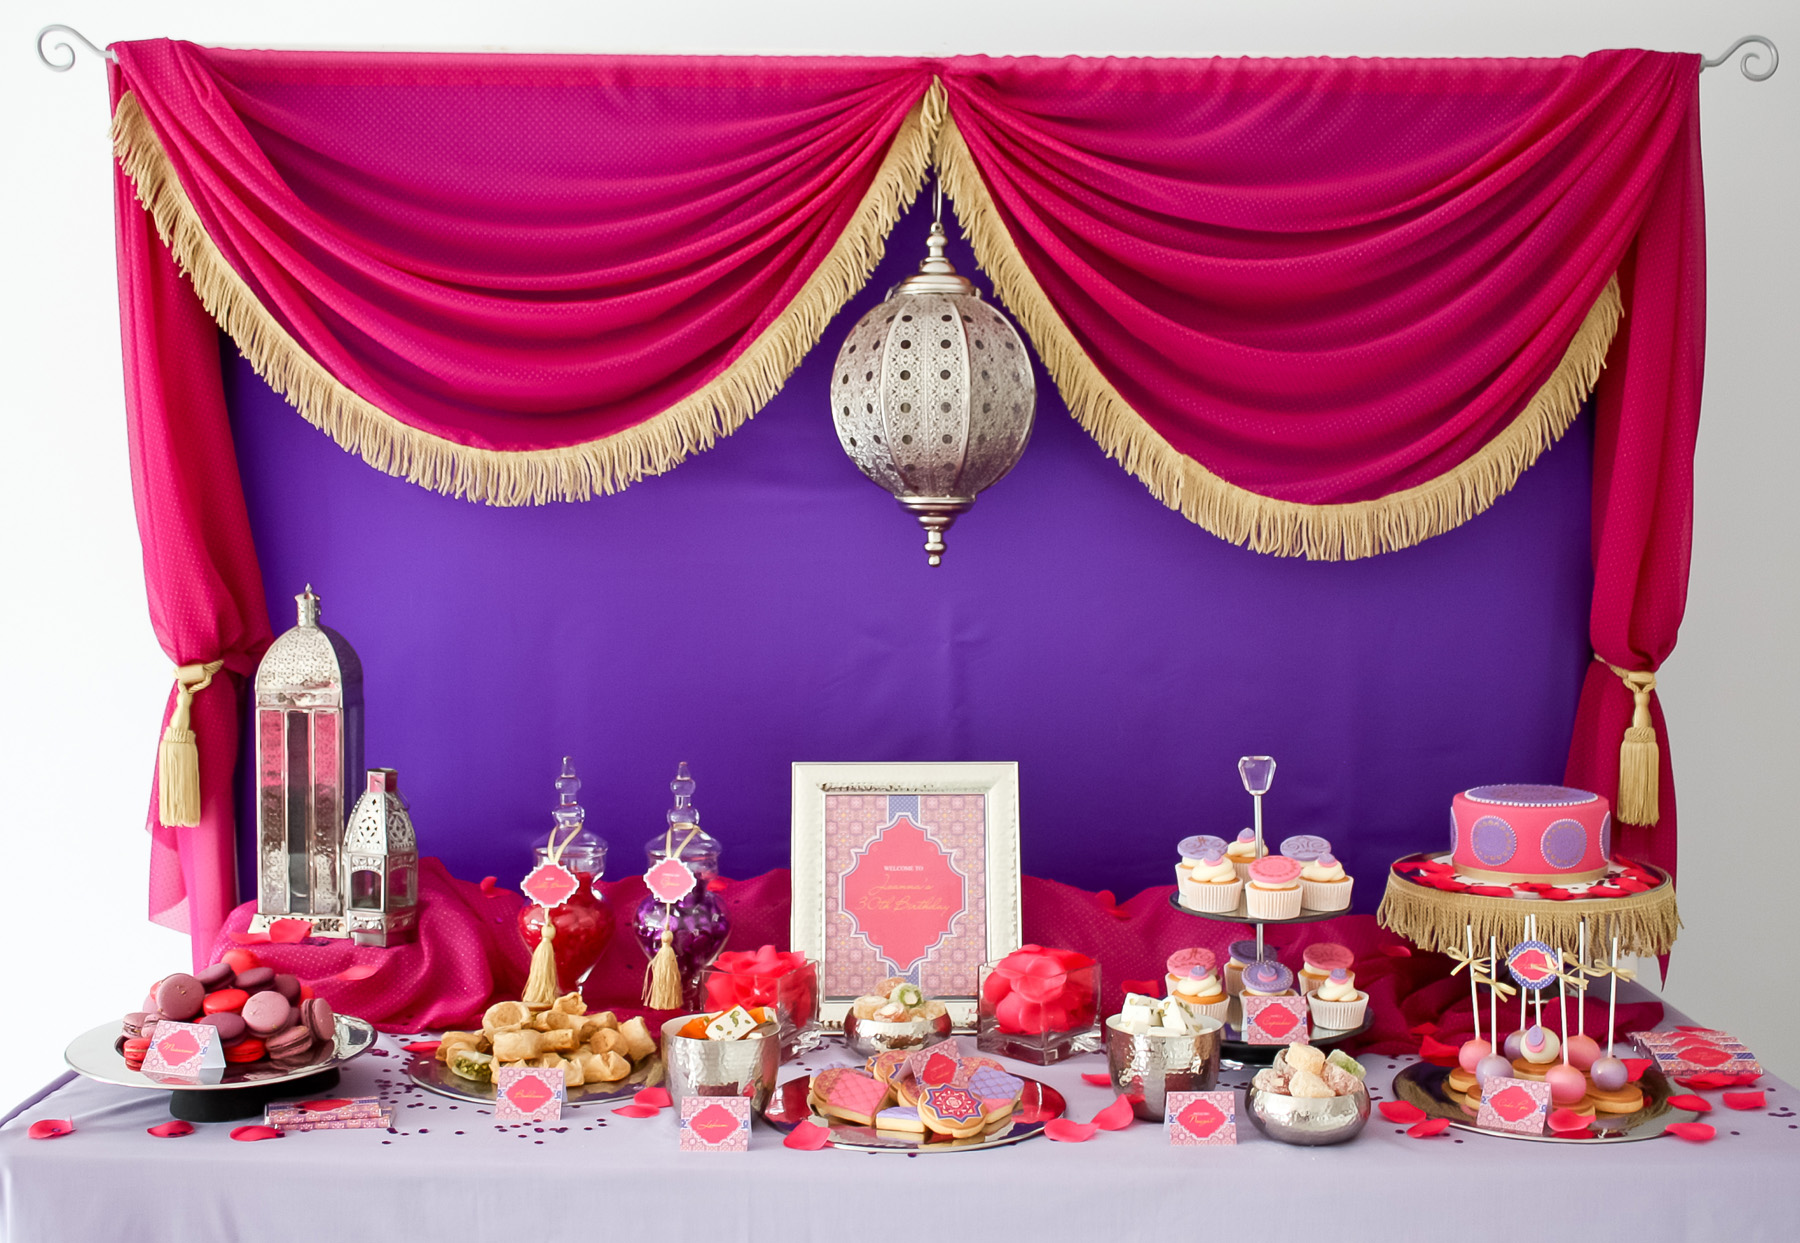 Moroccan Party Invitations surprise birthday party invitations wording – Moroccan Party Invitations